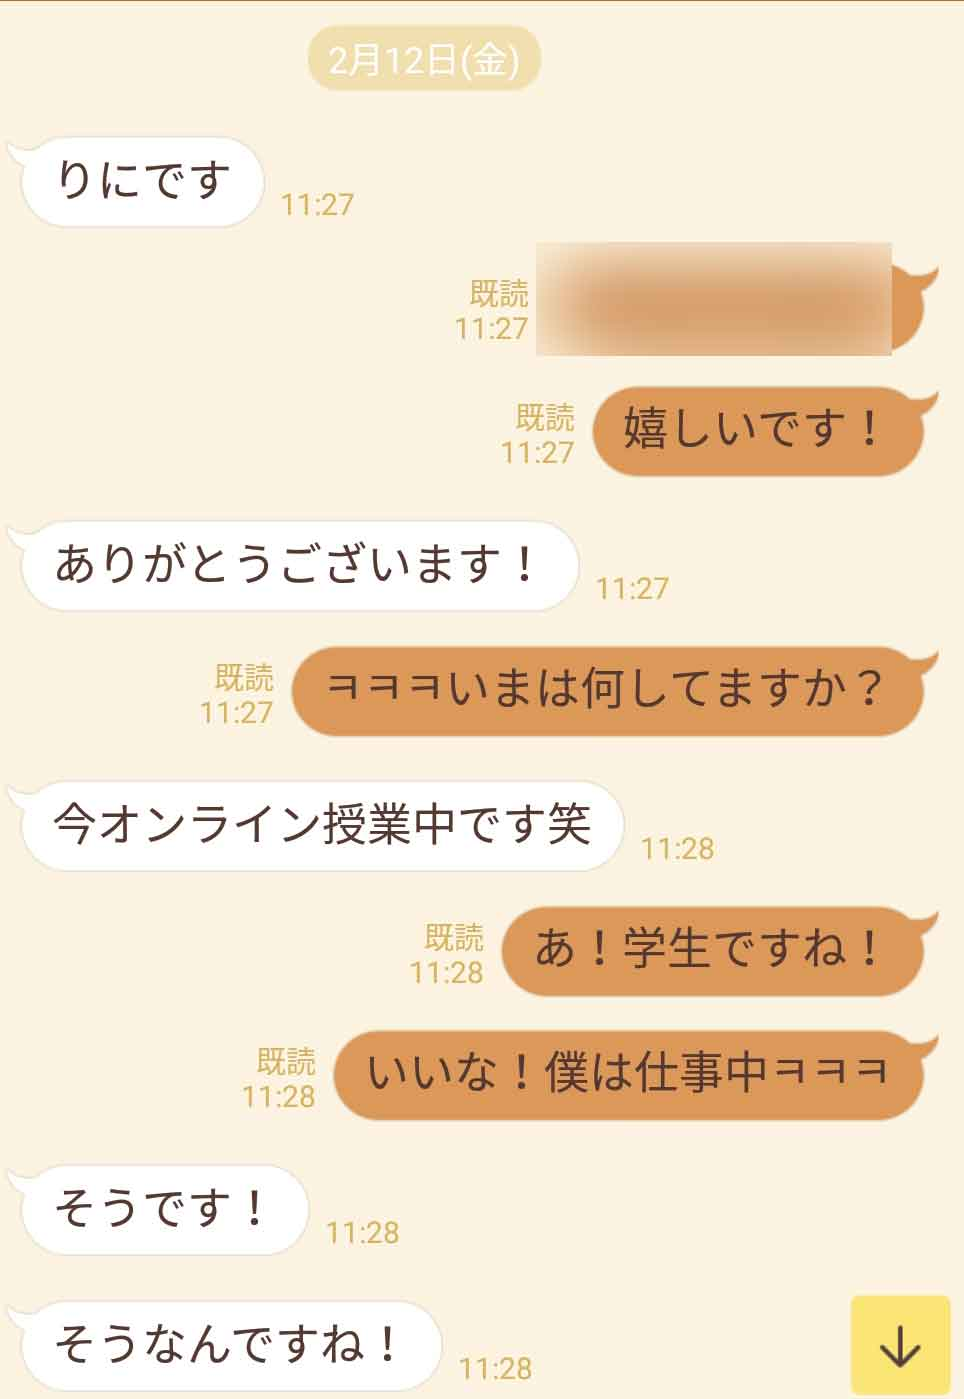 Jメールのオフパコ経験談-ライン